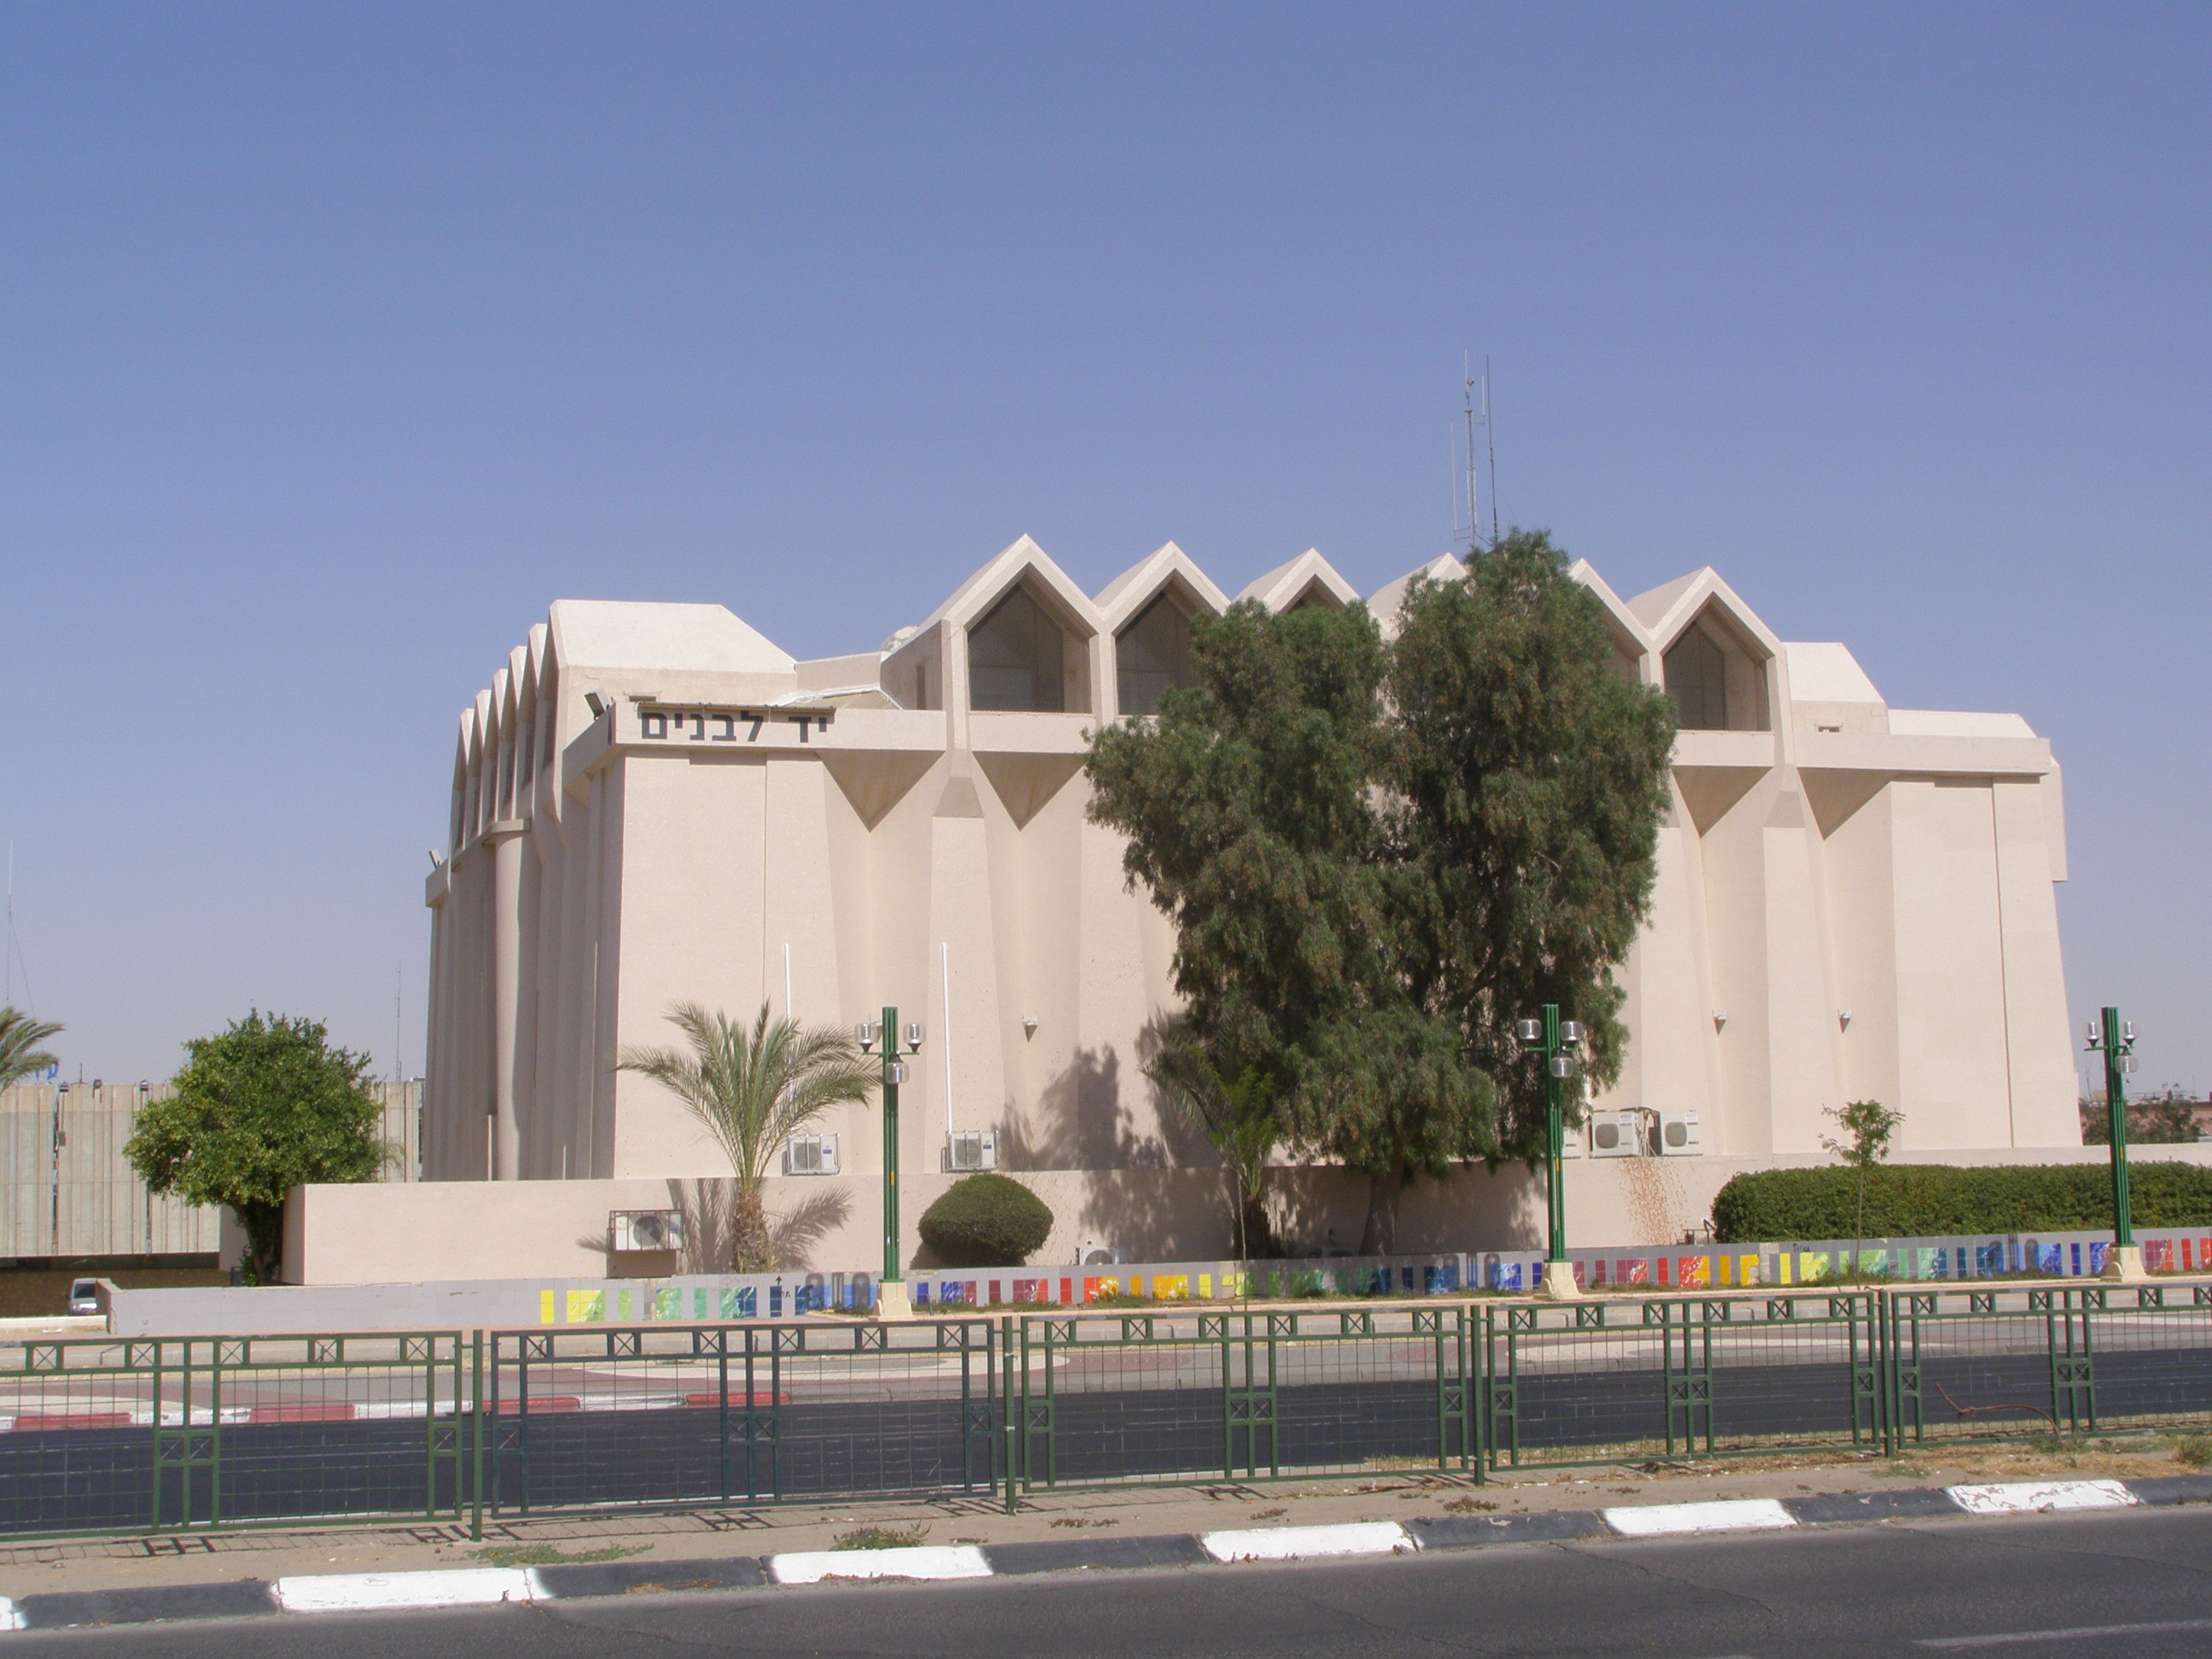 File:Beersheba, Yad LaBanim 01.jpg - Wikimedia Commons